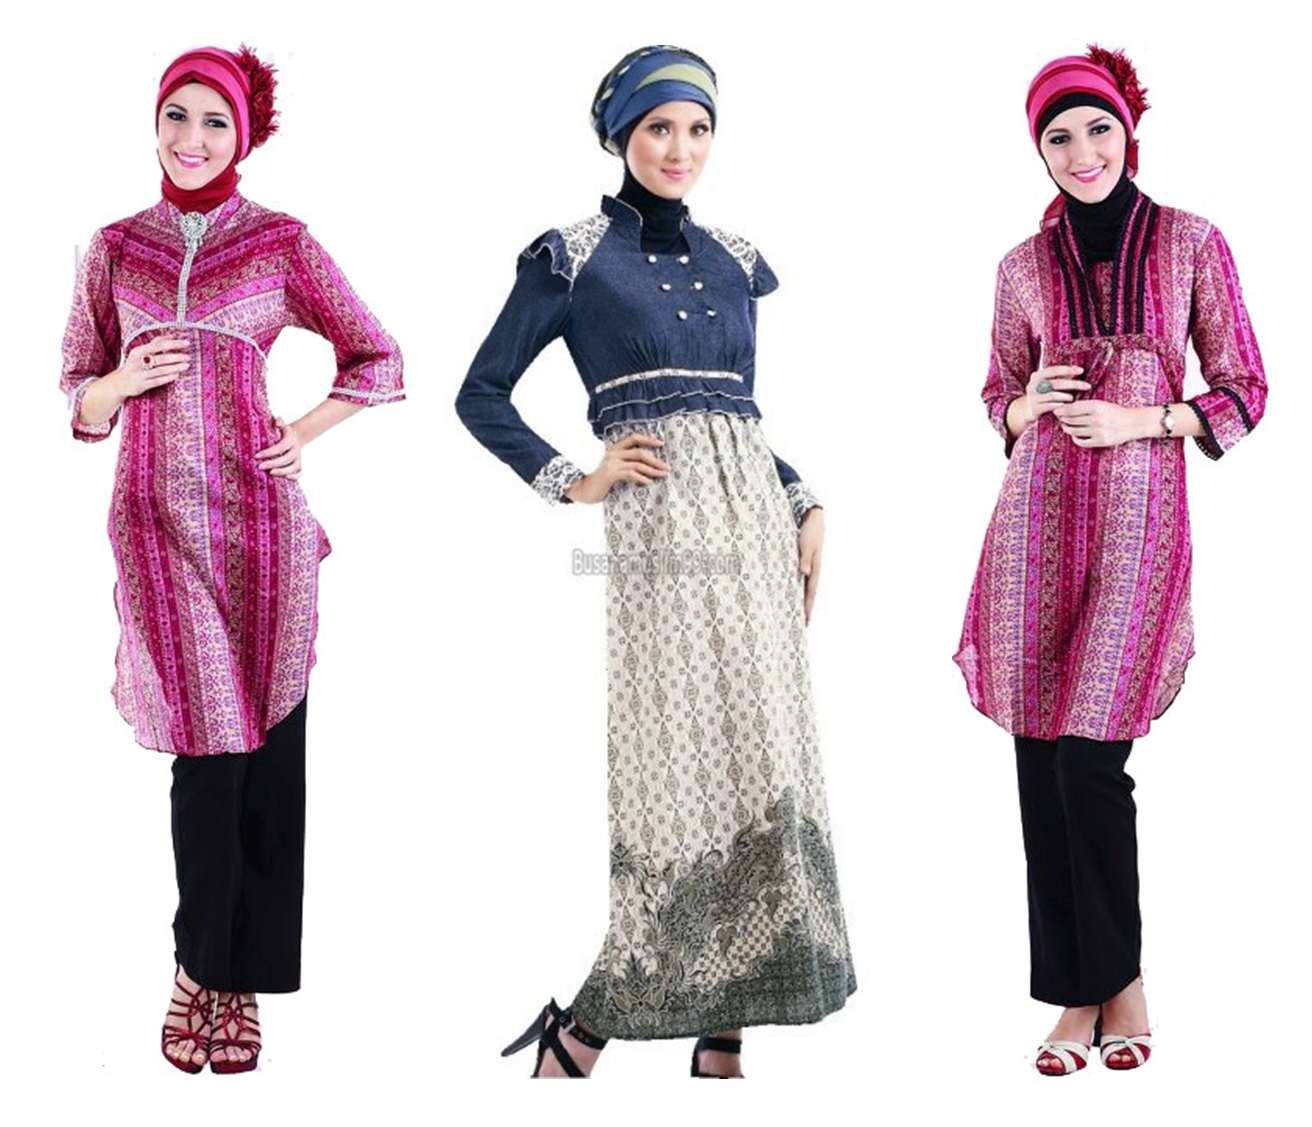 Gambar model busana muslim paling trendi dan cantik